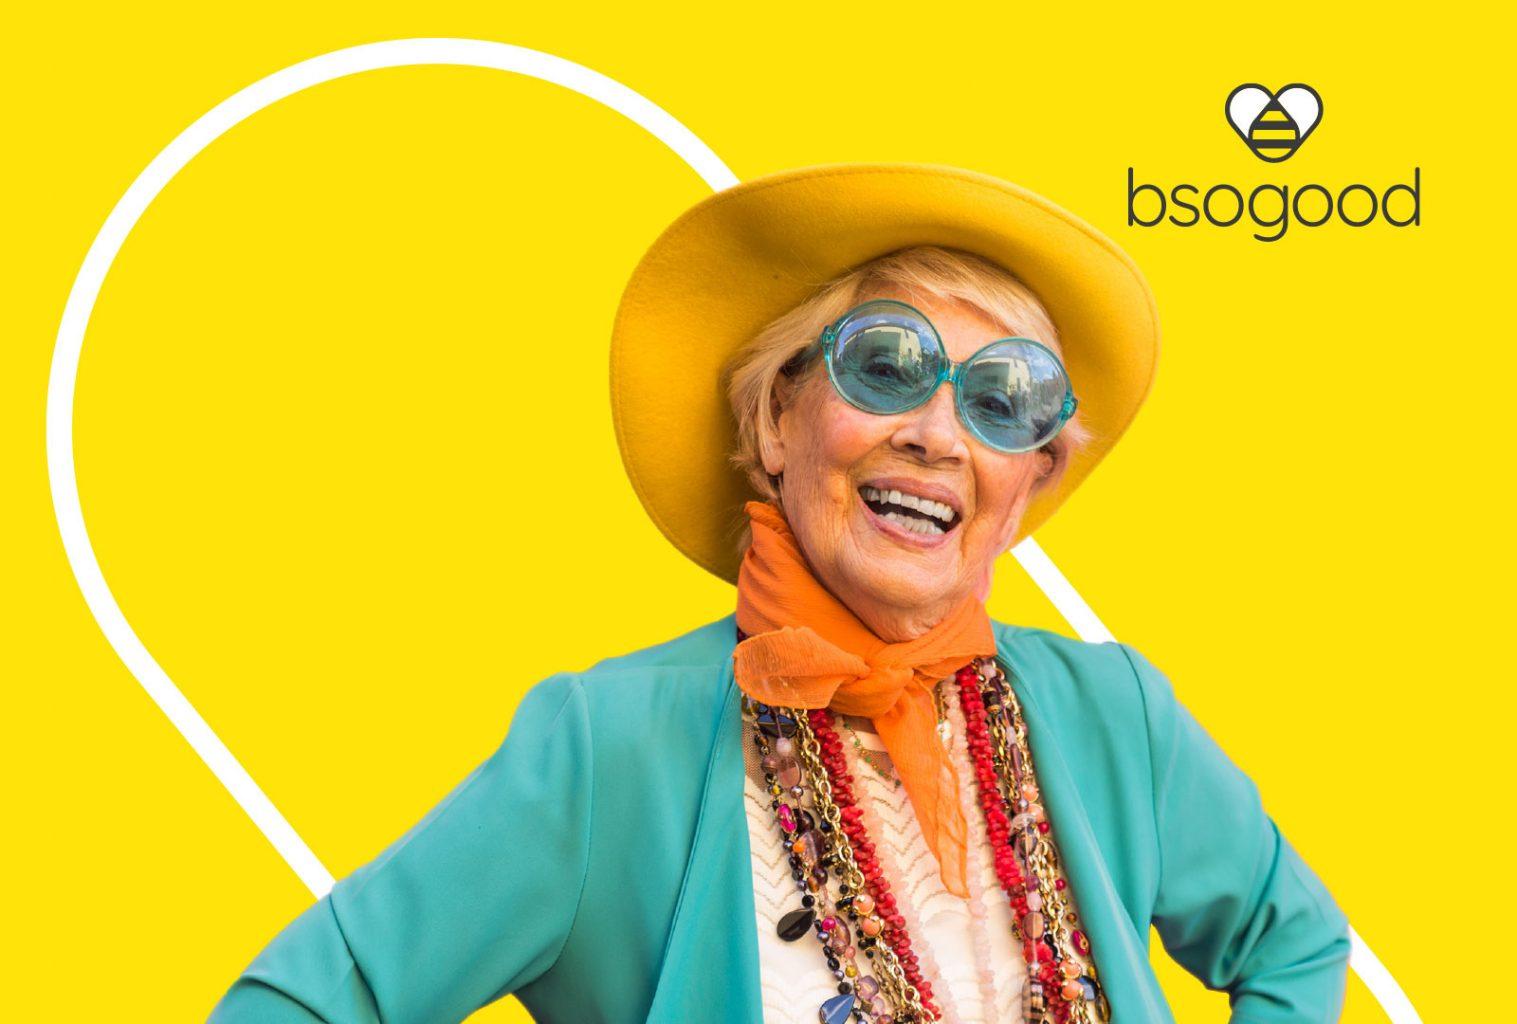 Bsogood Feature Image